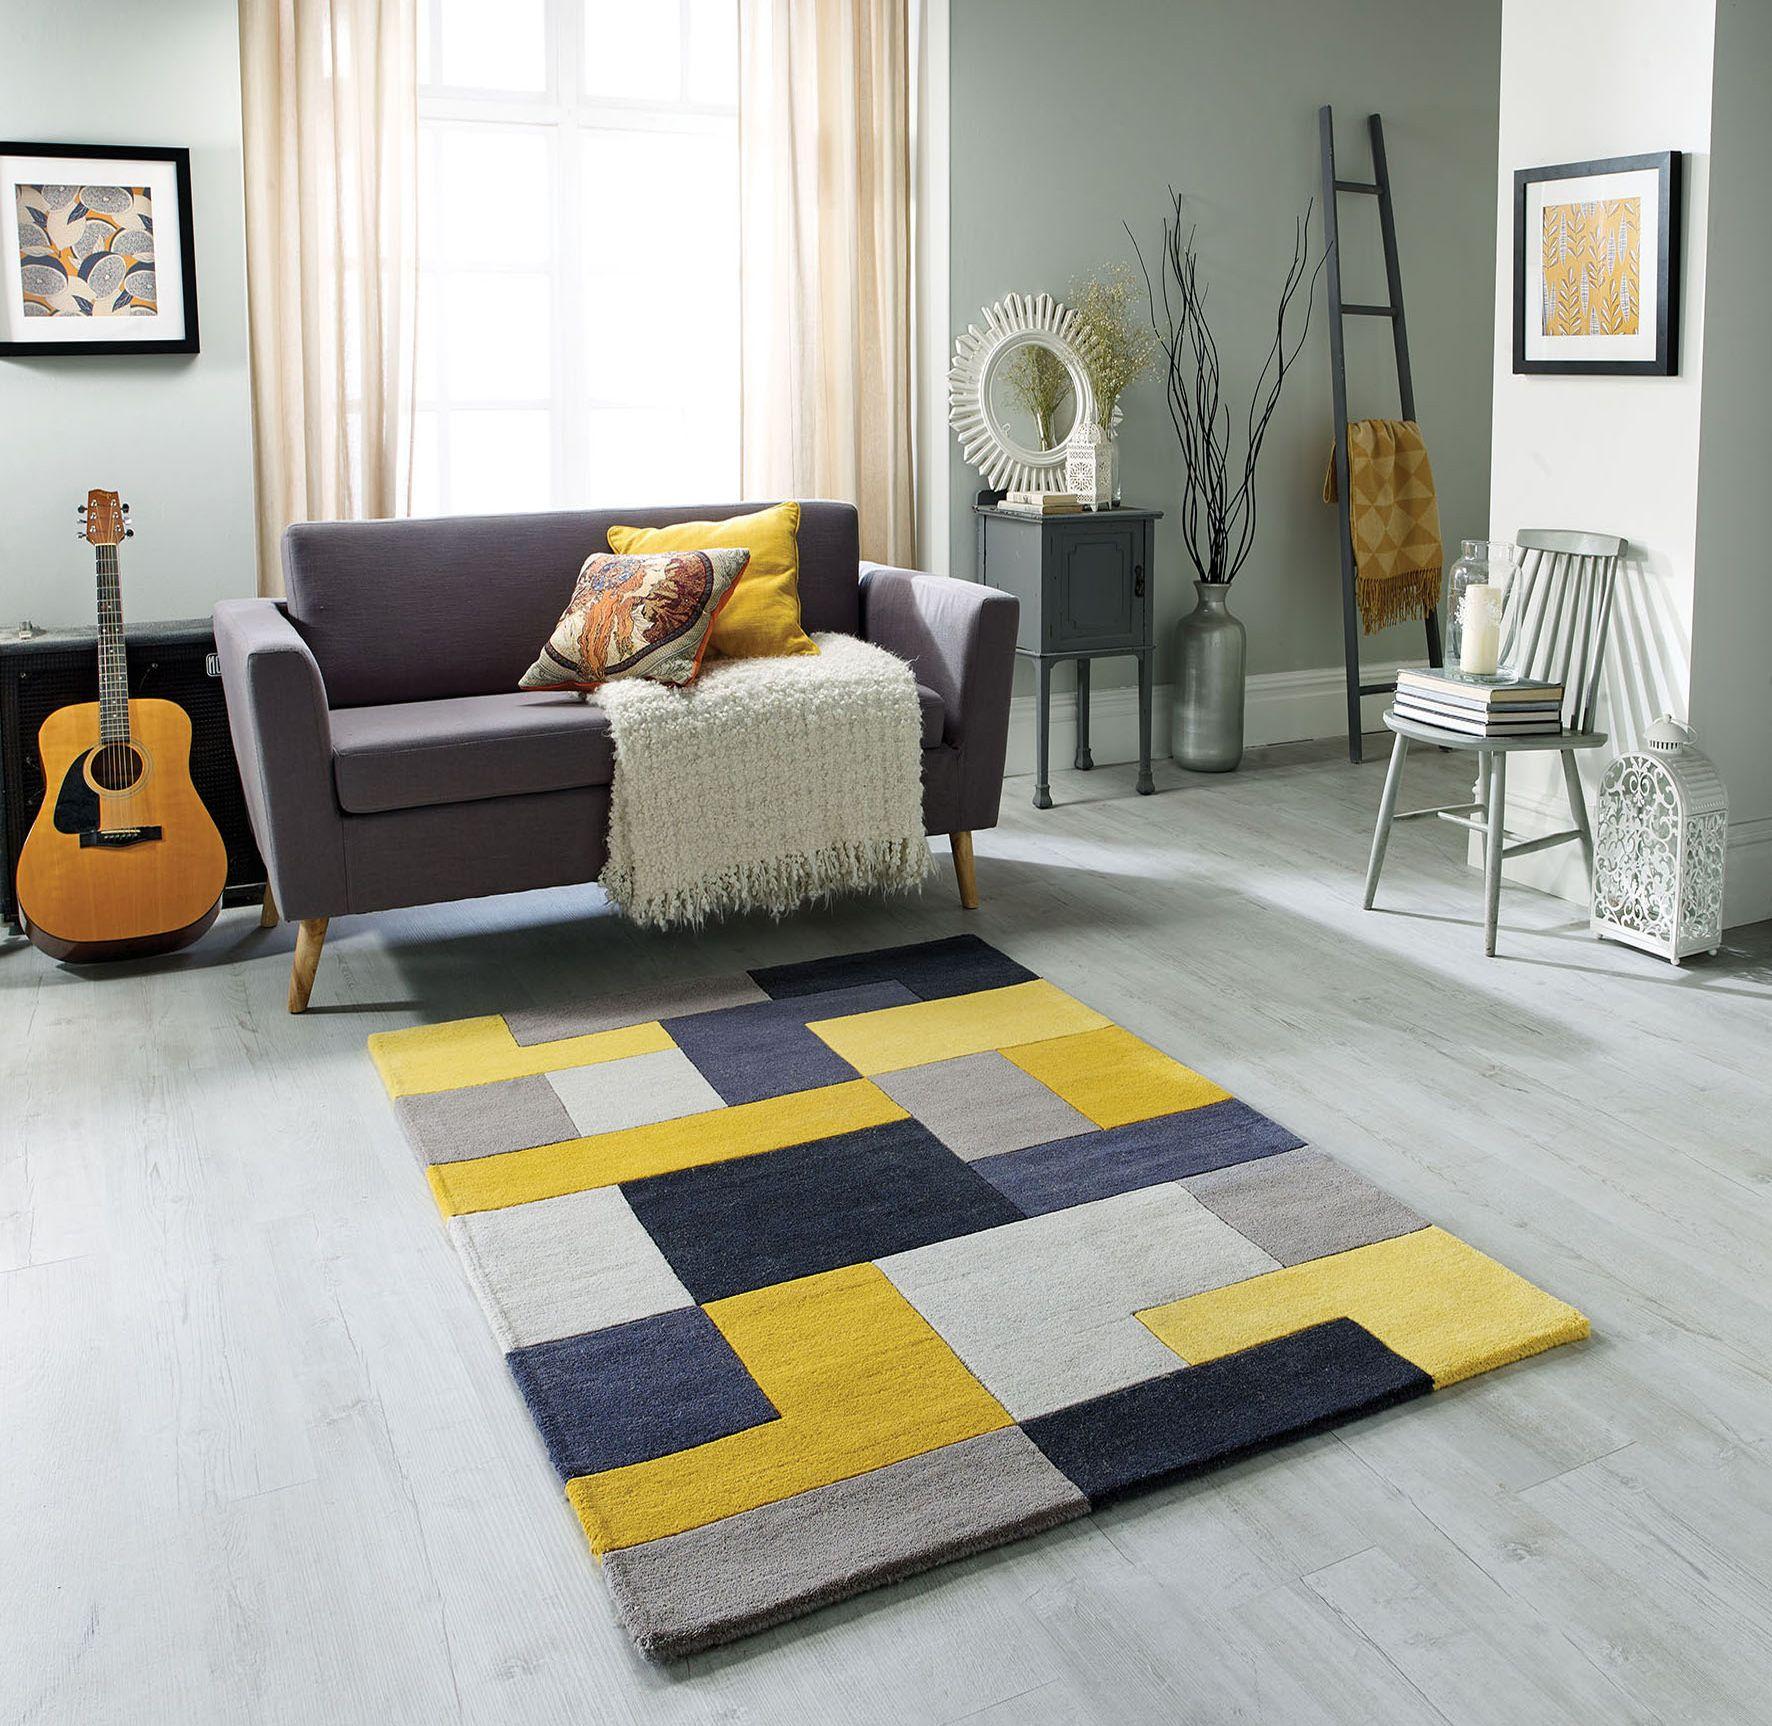 Lexus Yellow Rug In 2020 Yellow Rug Blue Carpet Bedroom Grey Rugs